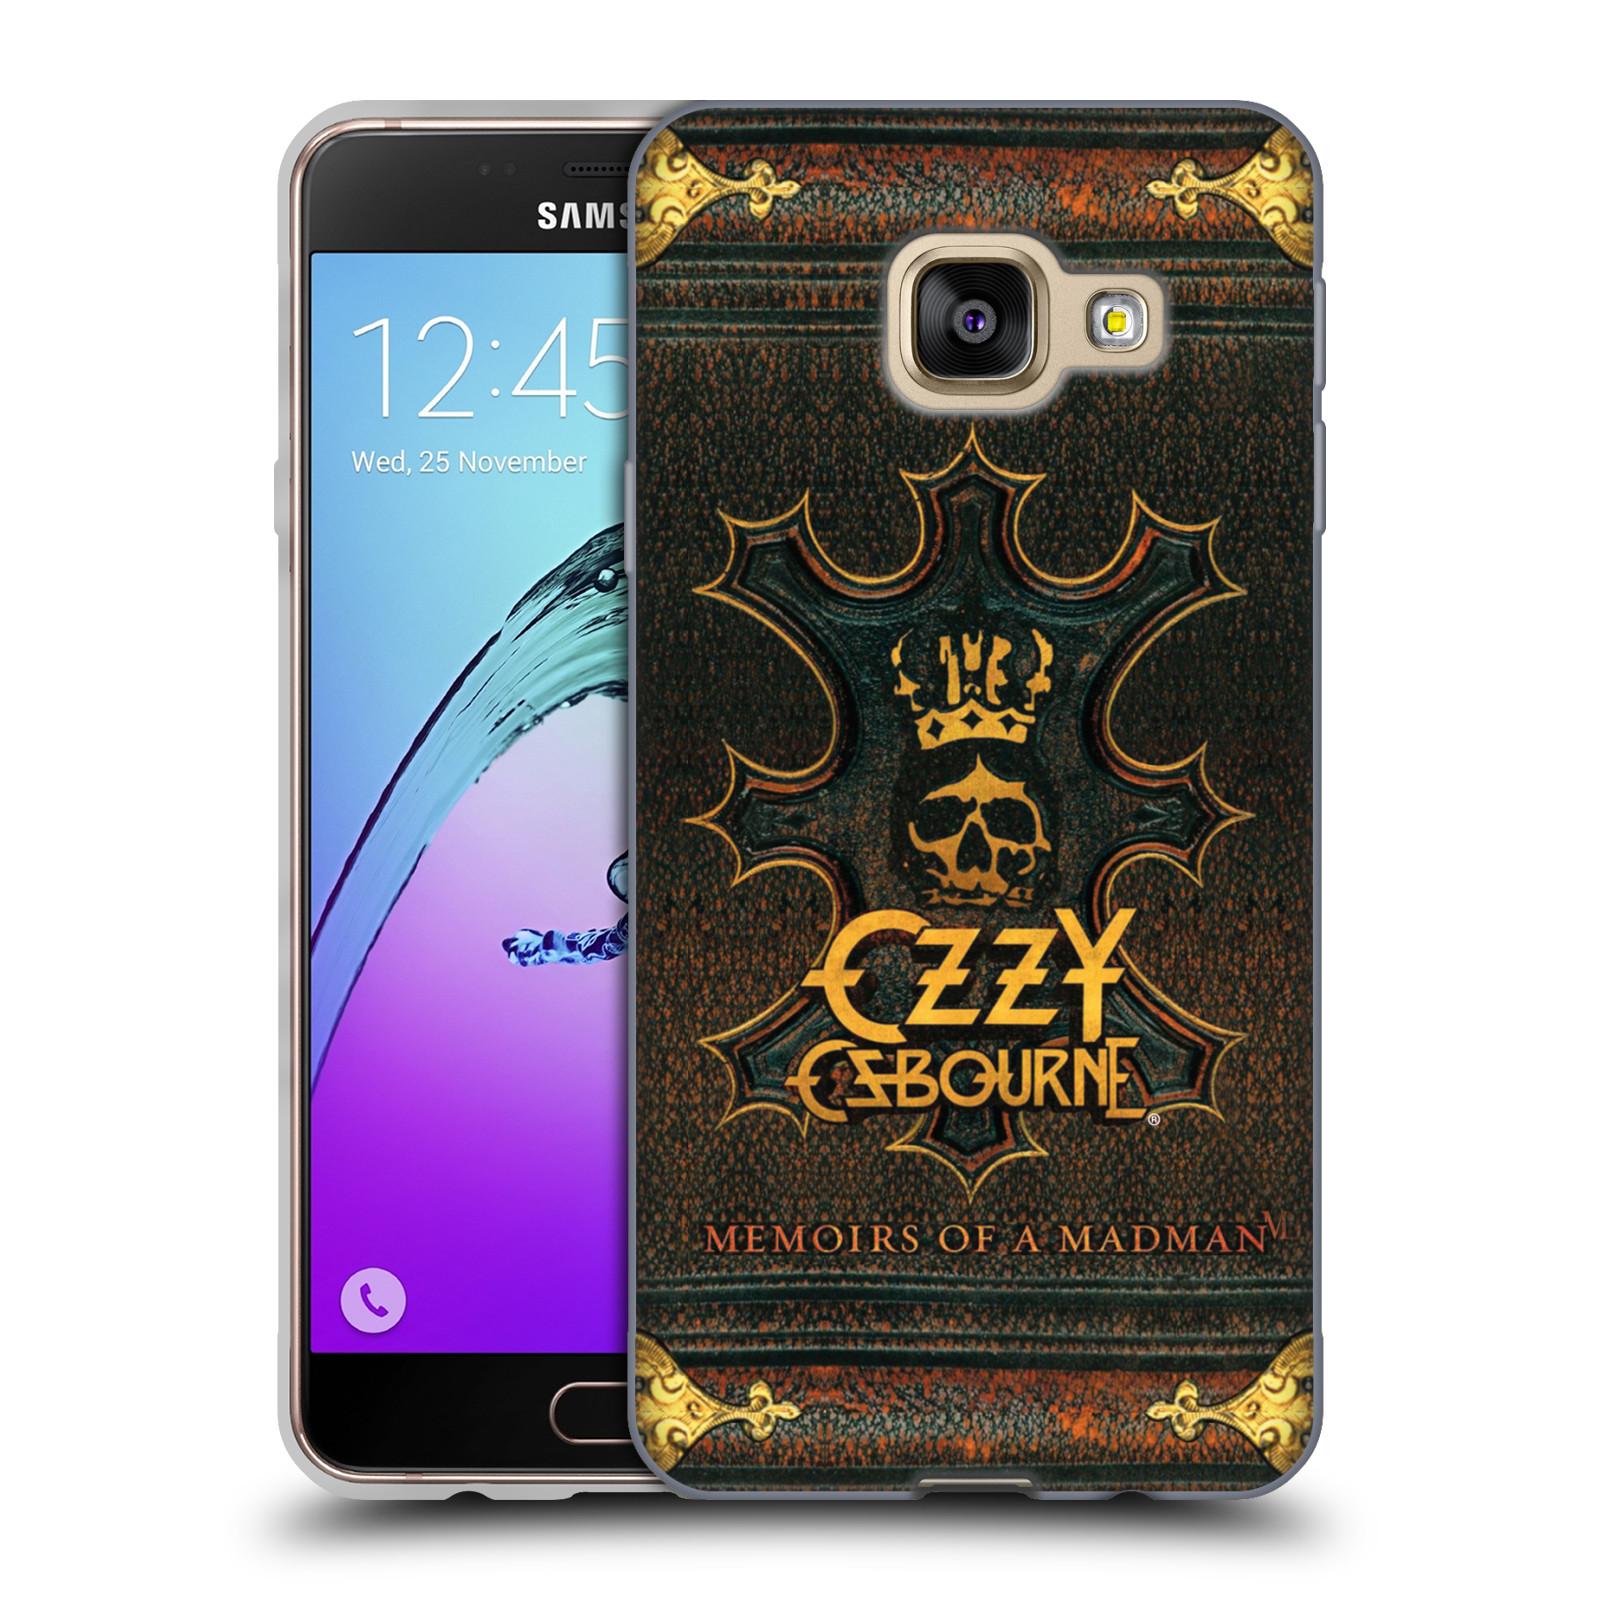 HEAD CASE silikonový obal na mobil Samsung Galaxy A3 2016 (A310) zpěvák Ozzy Osbourne koruna